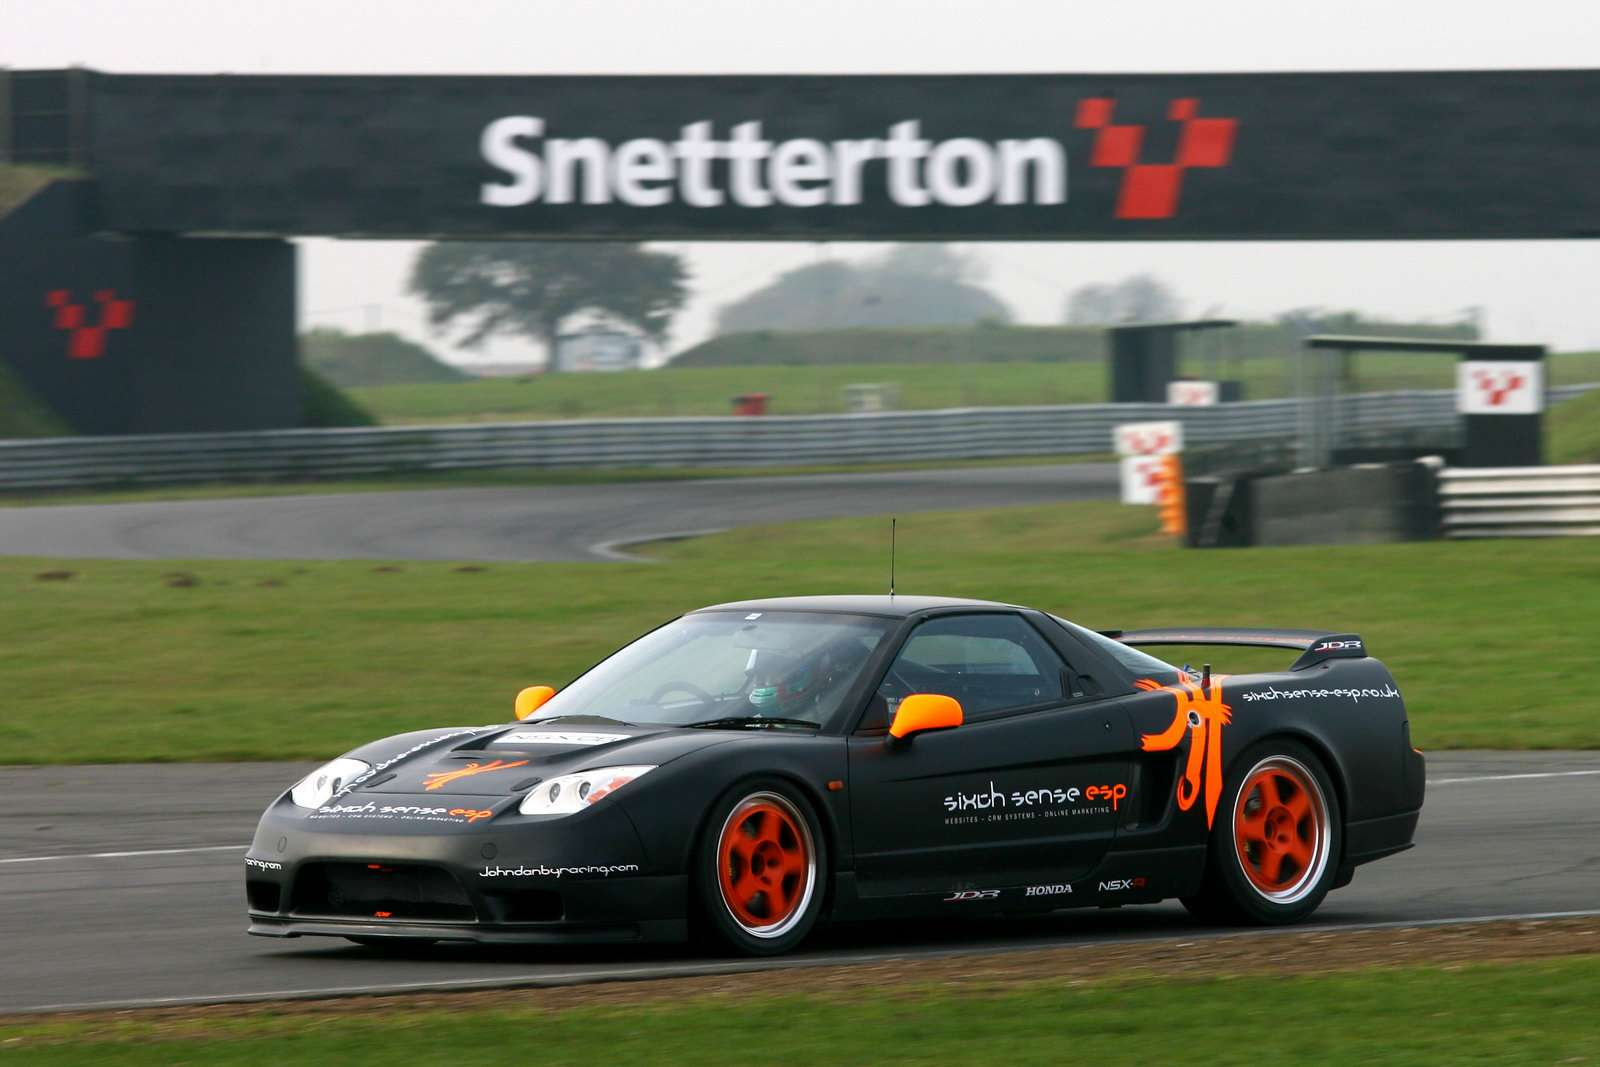 Honda NSX JDB na Britcar Championship 2009